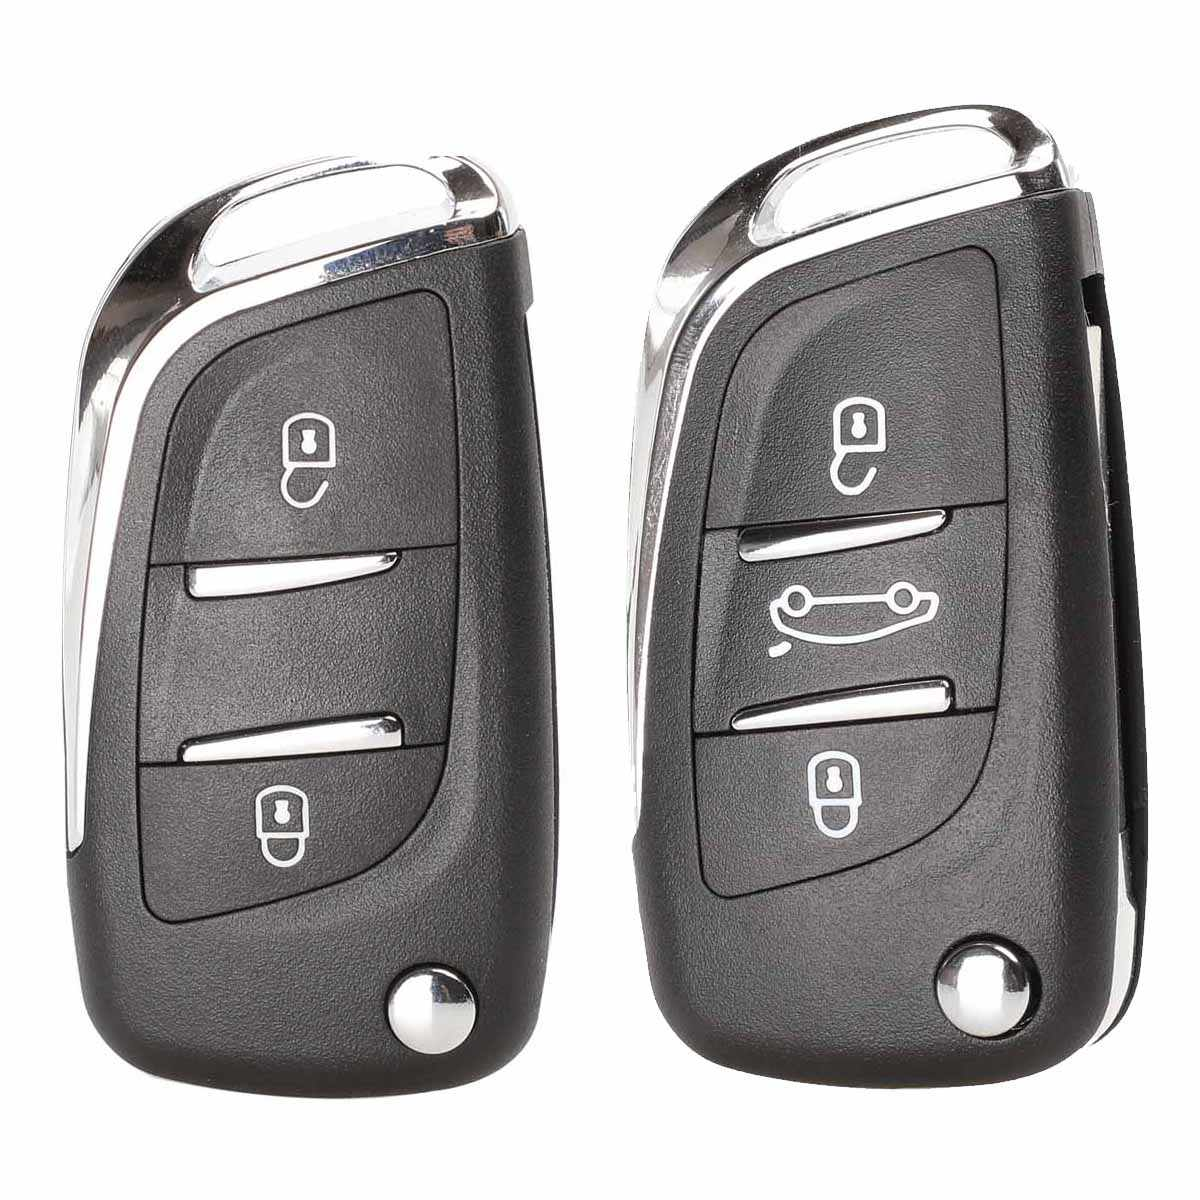 Jingyuqin พับรีโมทกุญแจรถ CE0536 สำหรับ Peugeot 407 307 408 308 CITROEN C2 C3 C4 C5 C6 XSARA GRAND PICASSO Groove